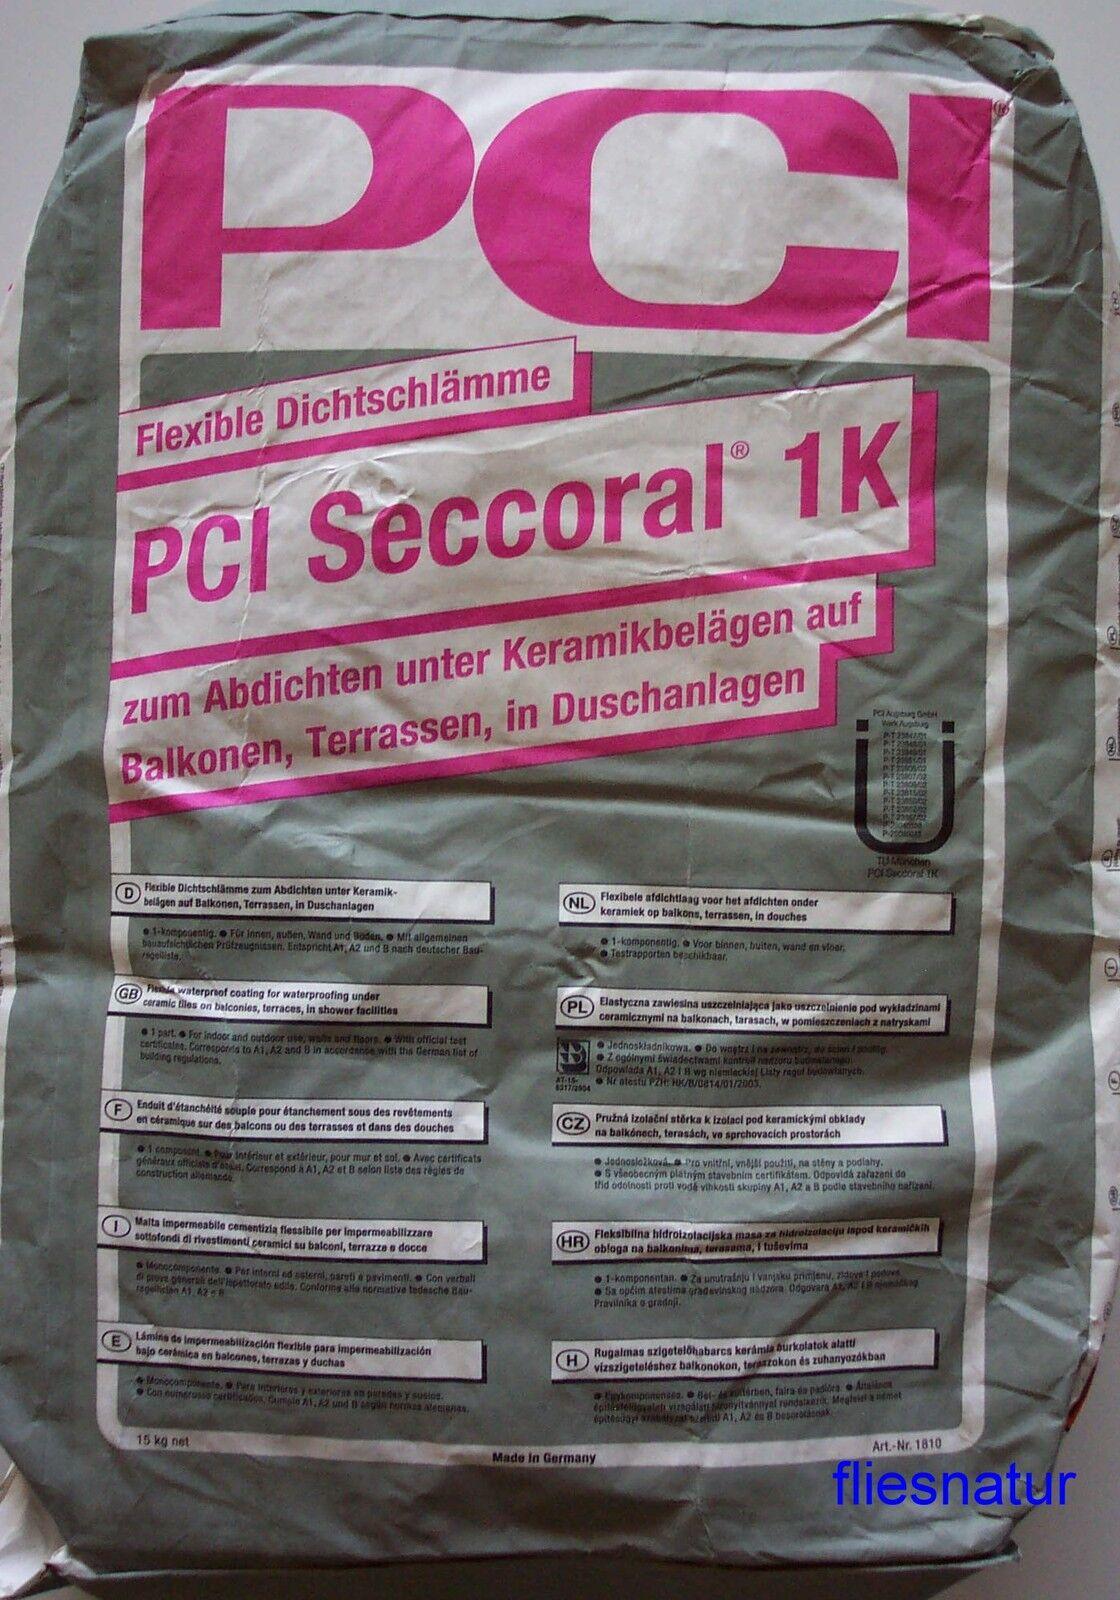 PCI Seccoral 1K 15kg Abdichtung Dichtschlämme Balkon Terrasse Dusche Dichtfolie